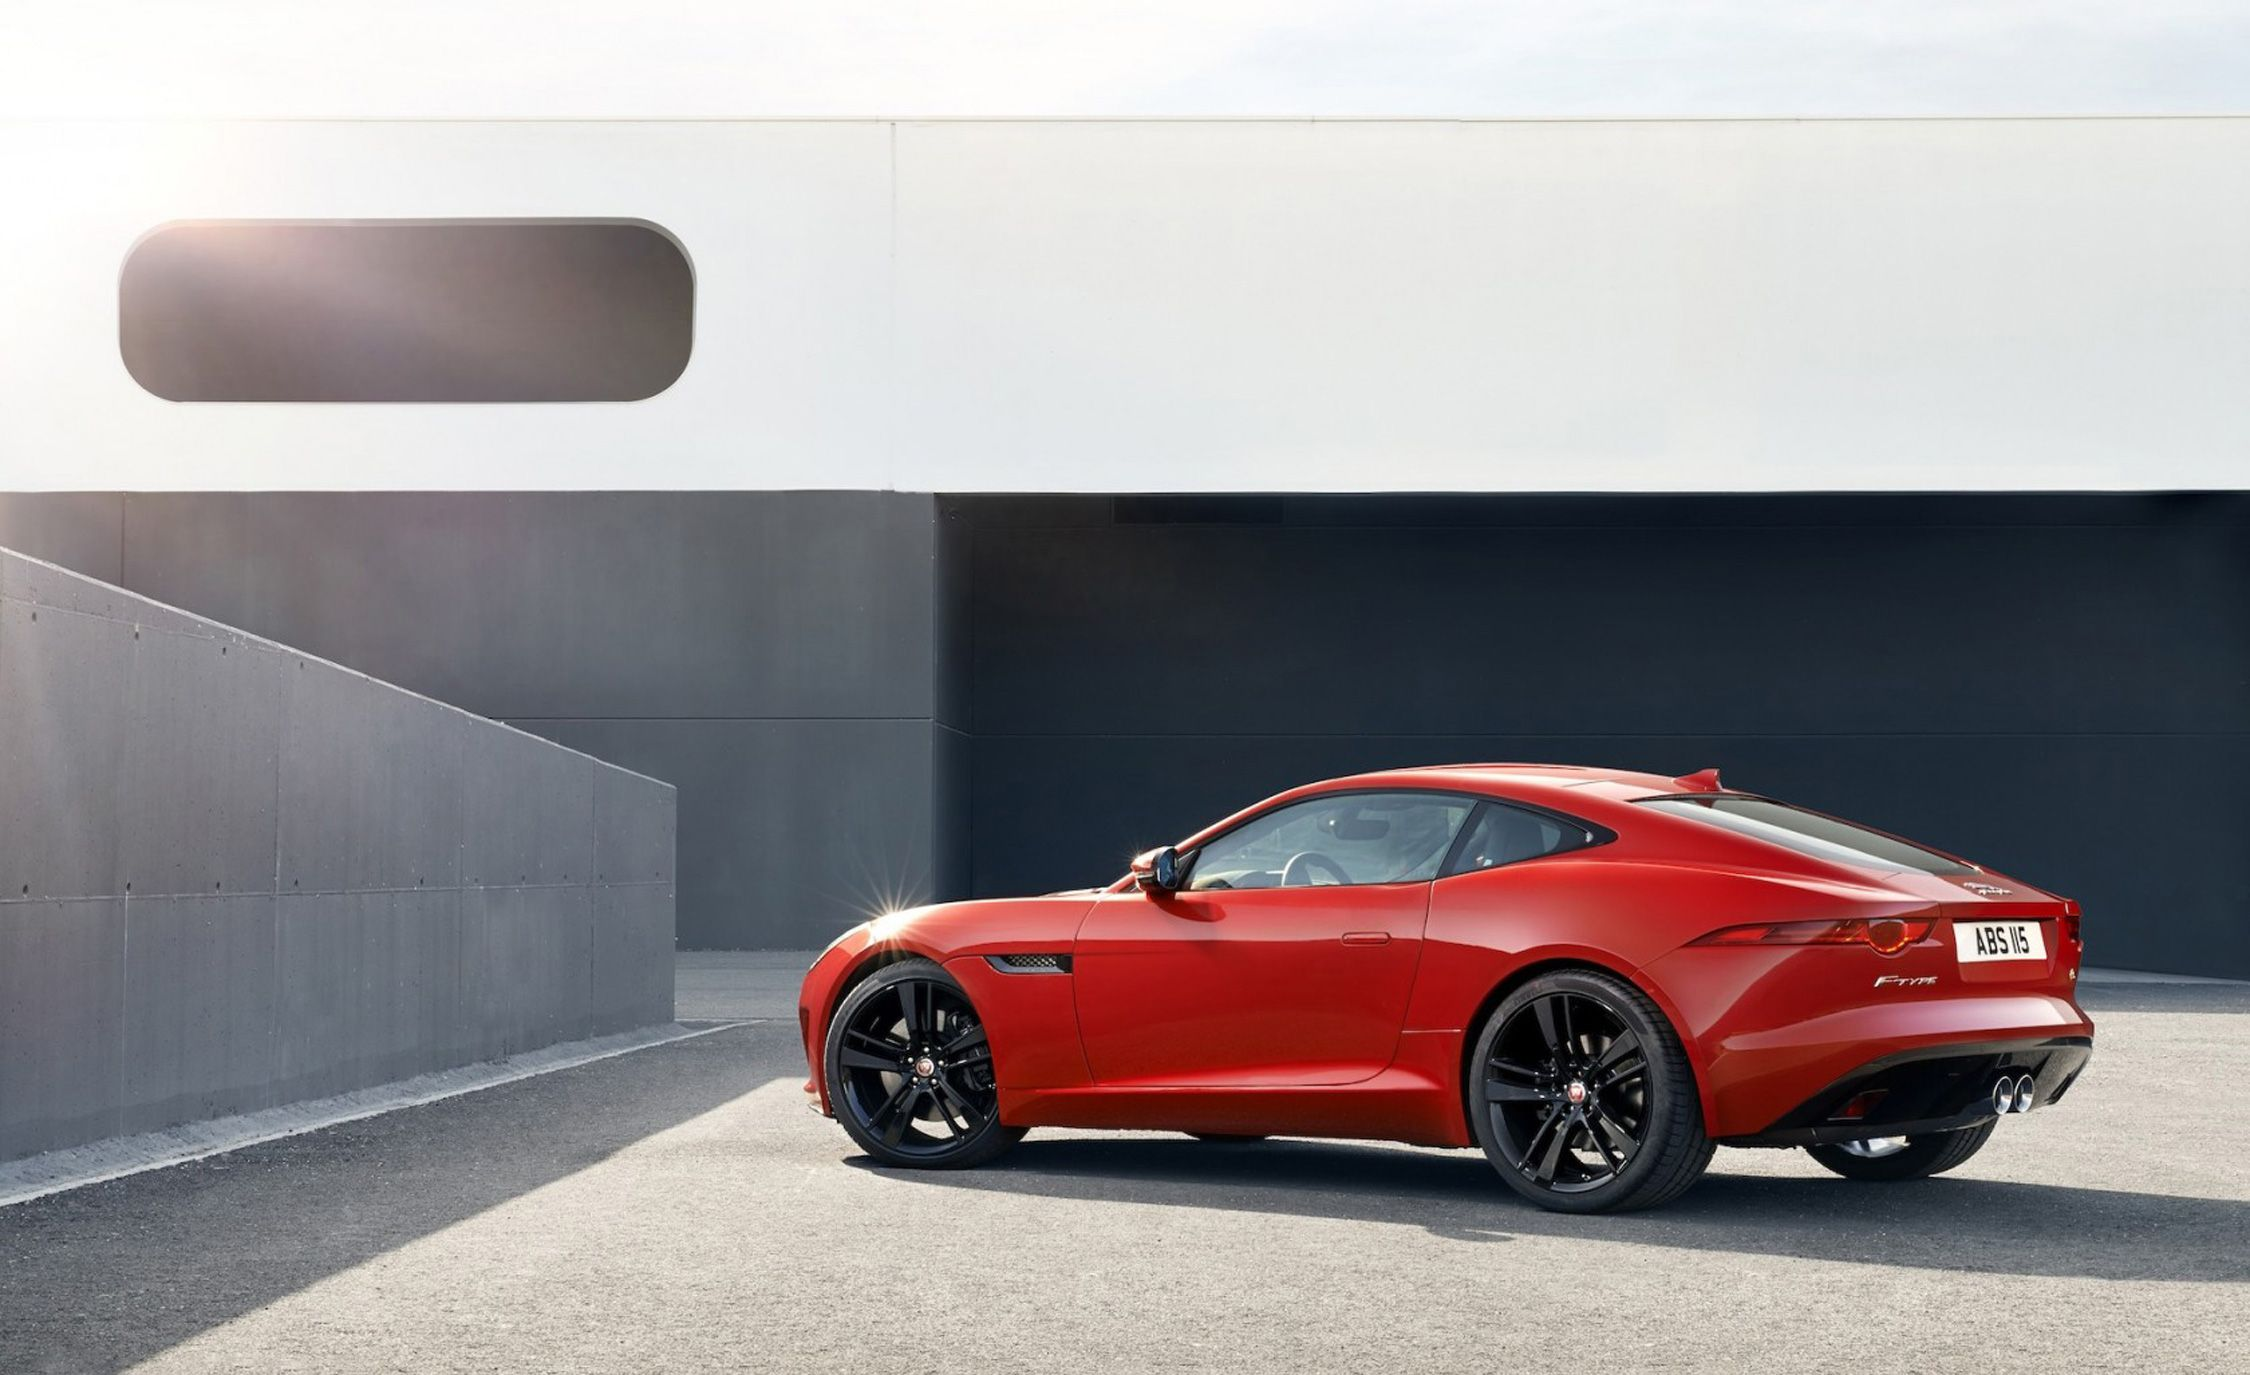 https://hips.hearstapps.com/amv-prod-cad-assets.s3.amazonaws.com/wp-content/uploads/2014/12/2015-jaguar-f-type-r-coupe-photo-588096-s-1280x7821.jpg